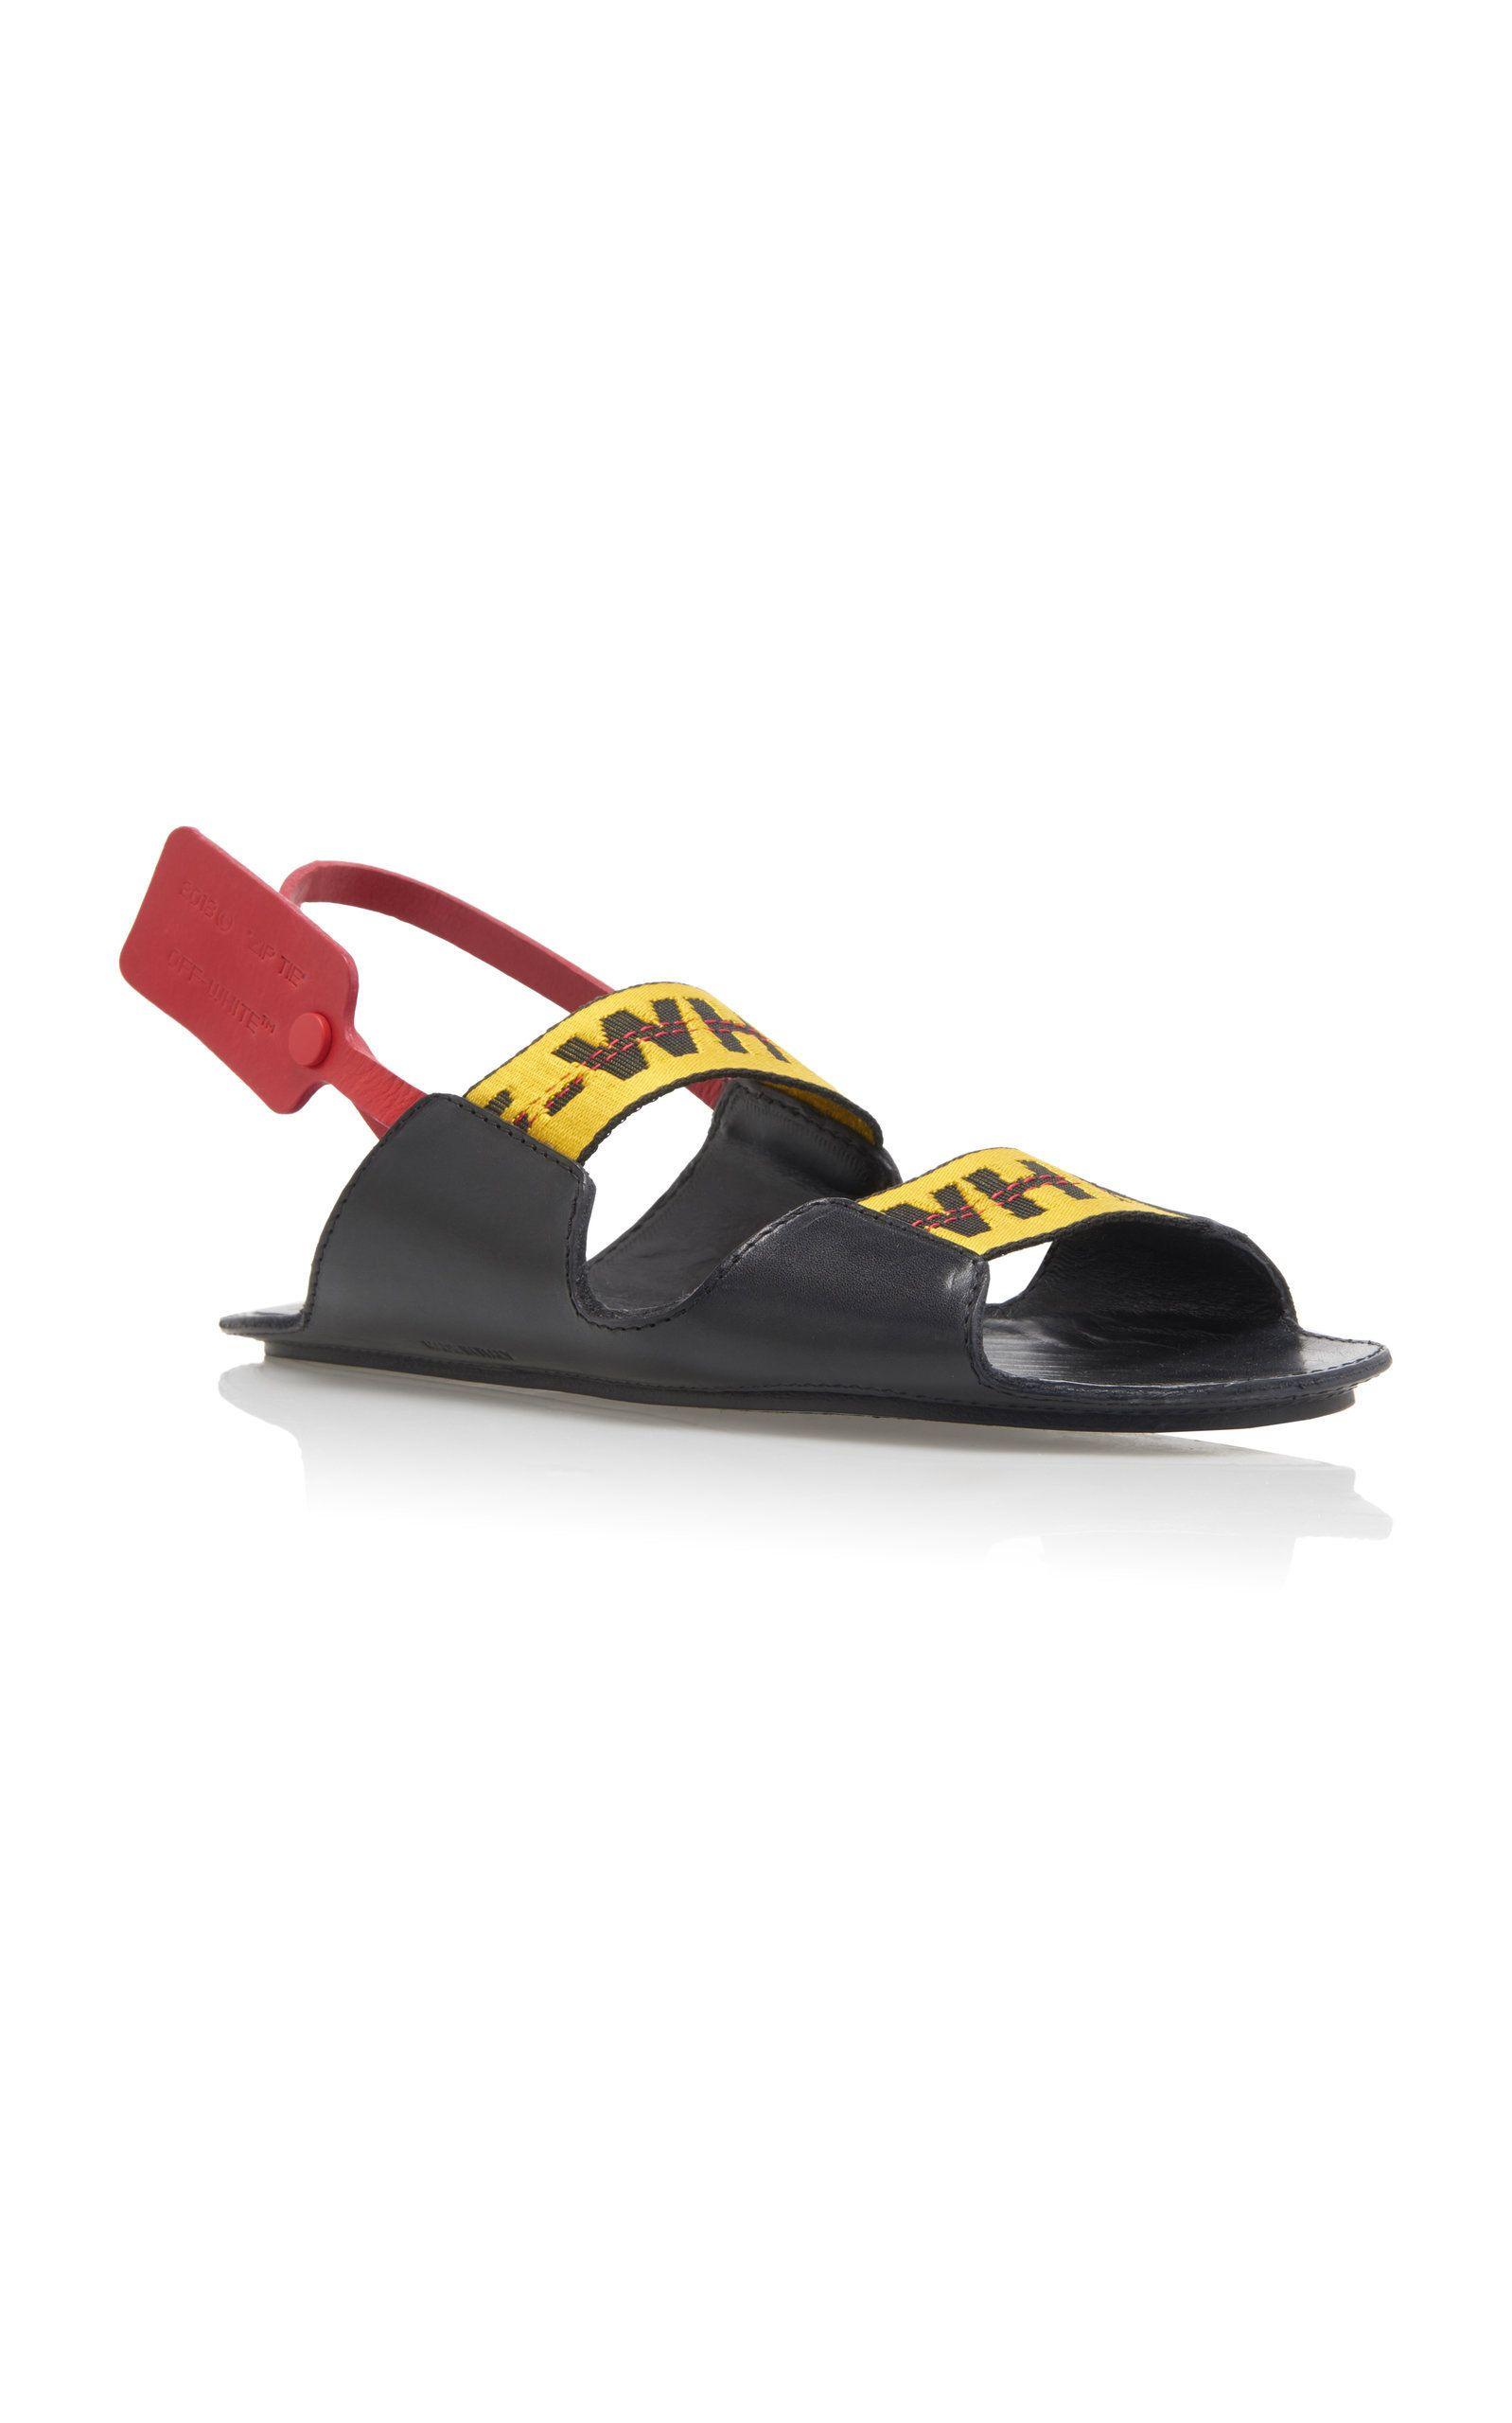 1d9f517c9c3d Off-White C/O Virgil Abloh - Zip Tie Leather Sandal   eccentric ...